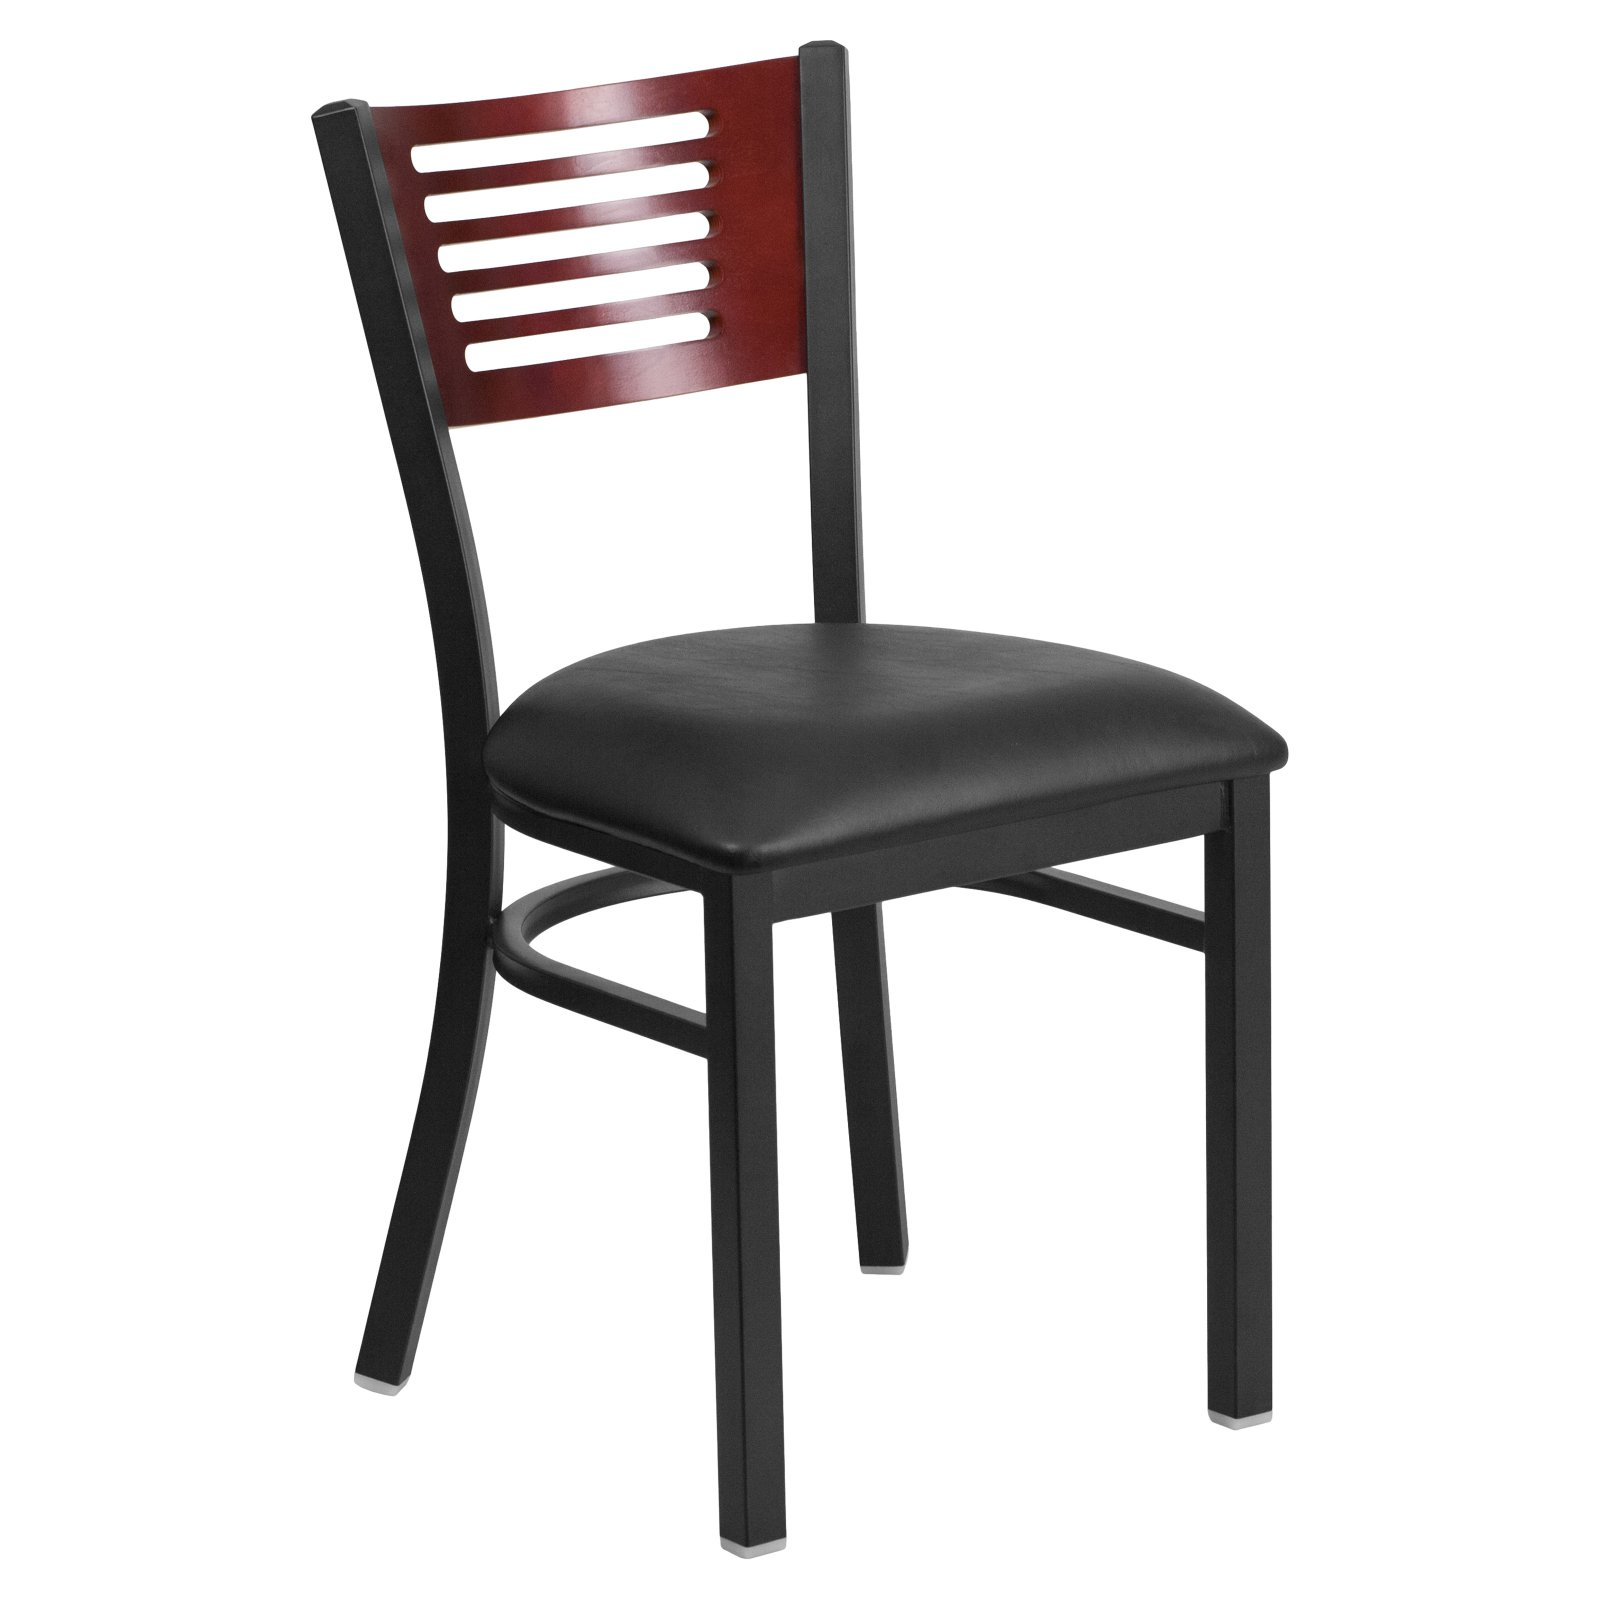 Flash Furniture HERCULES Series Black Decorative Slat Back Metal Restaurant Chair, Mahogany Wood Back, Vinyl Seat, Multiple Colors